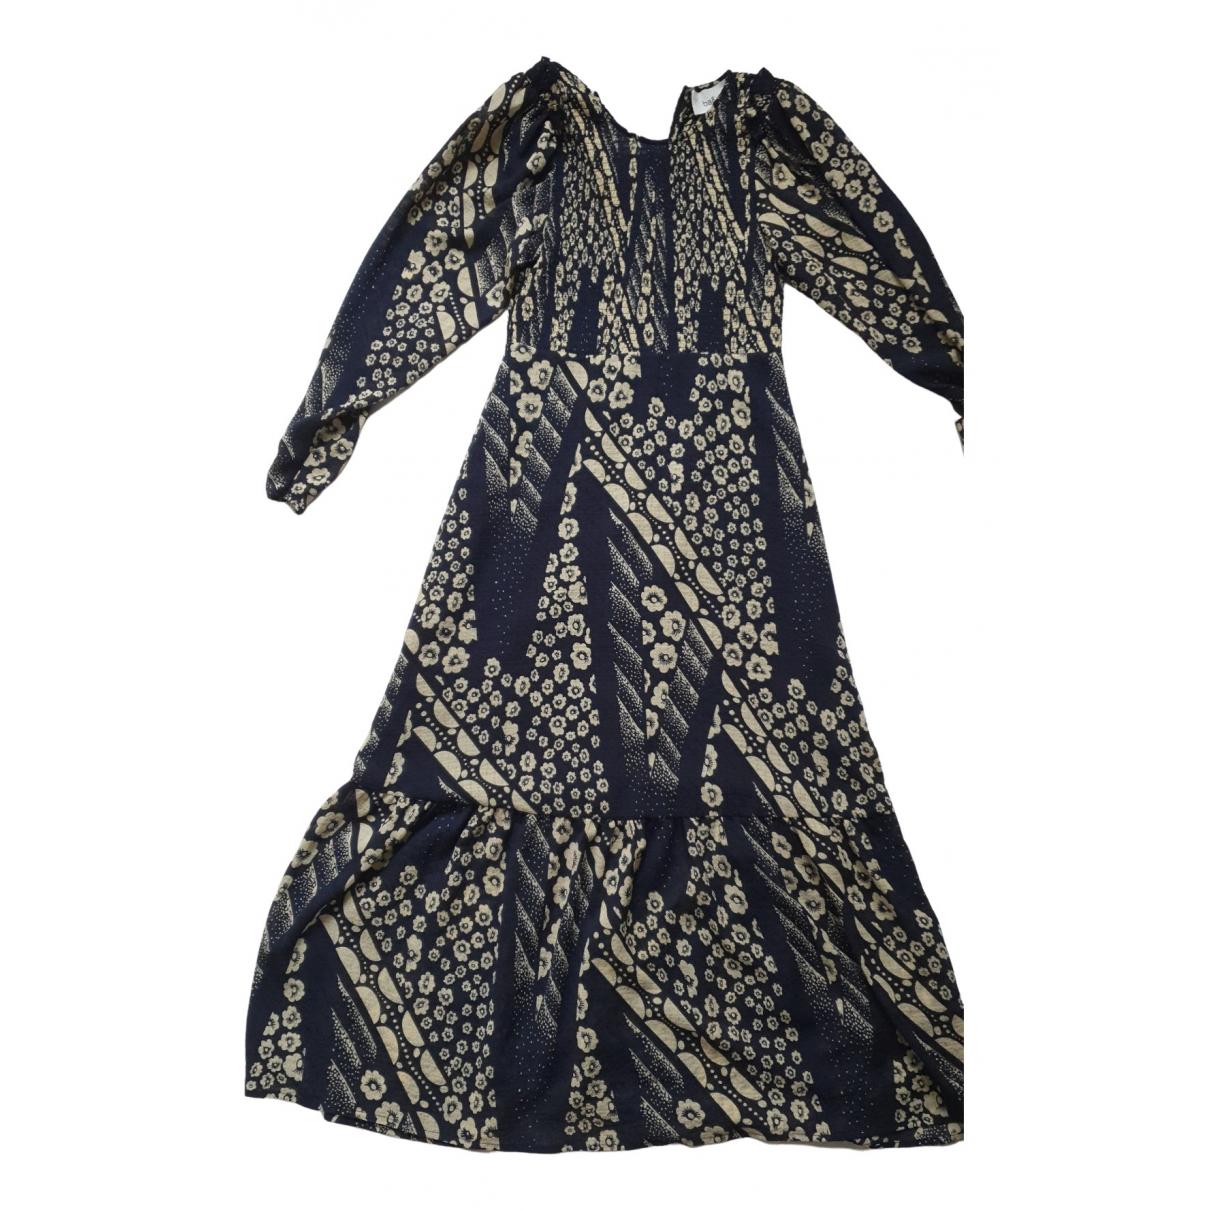 Ba&sh - Robe Fall Winter 2019 pour femme en soie - marine